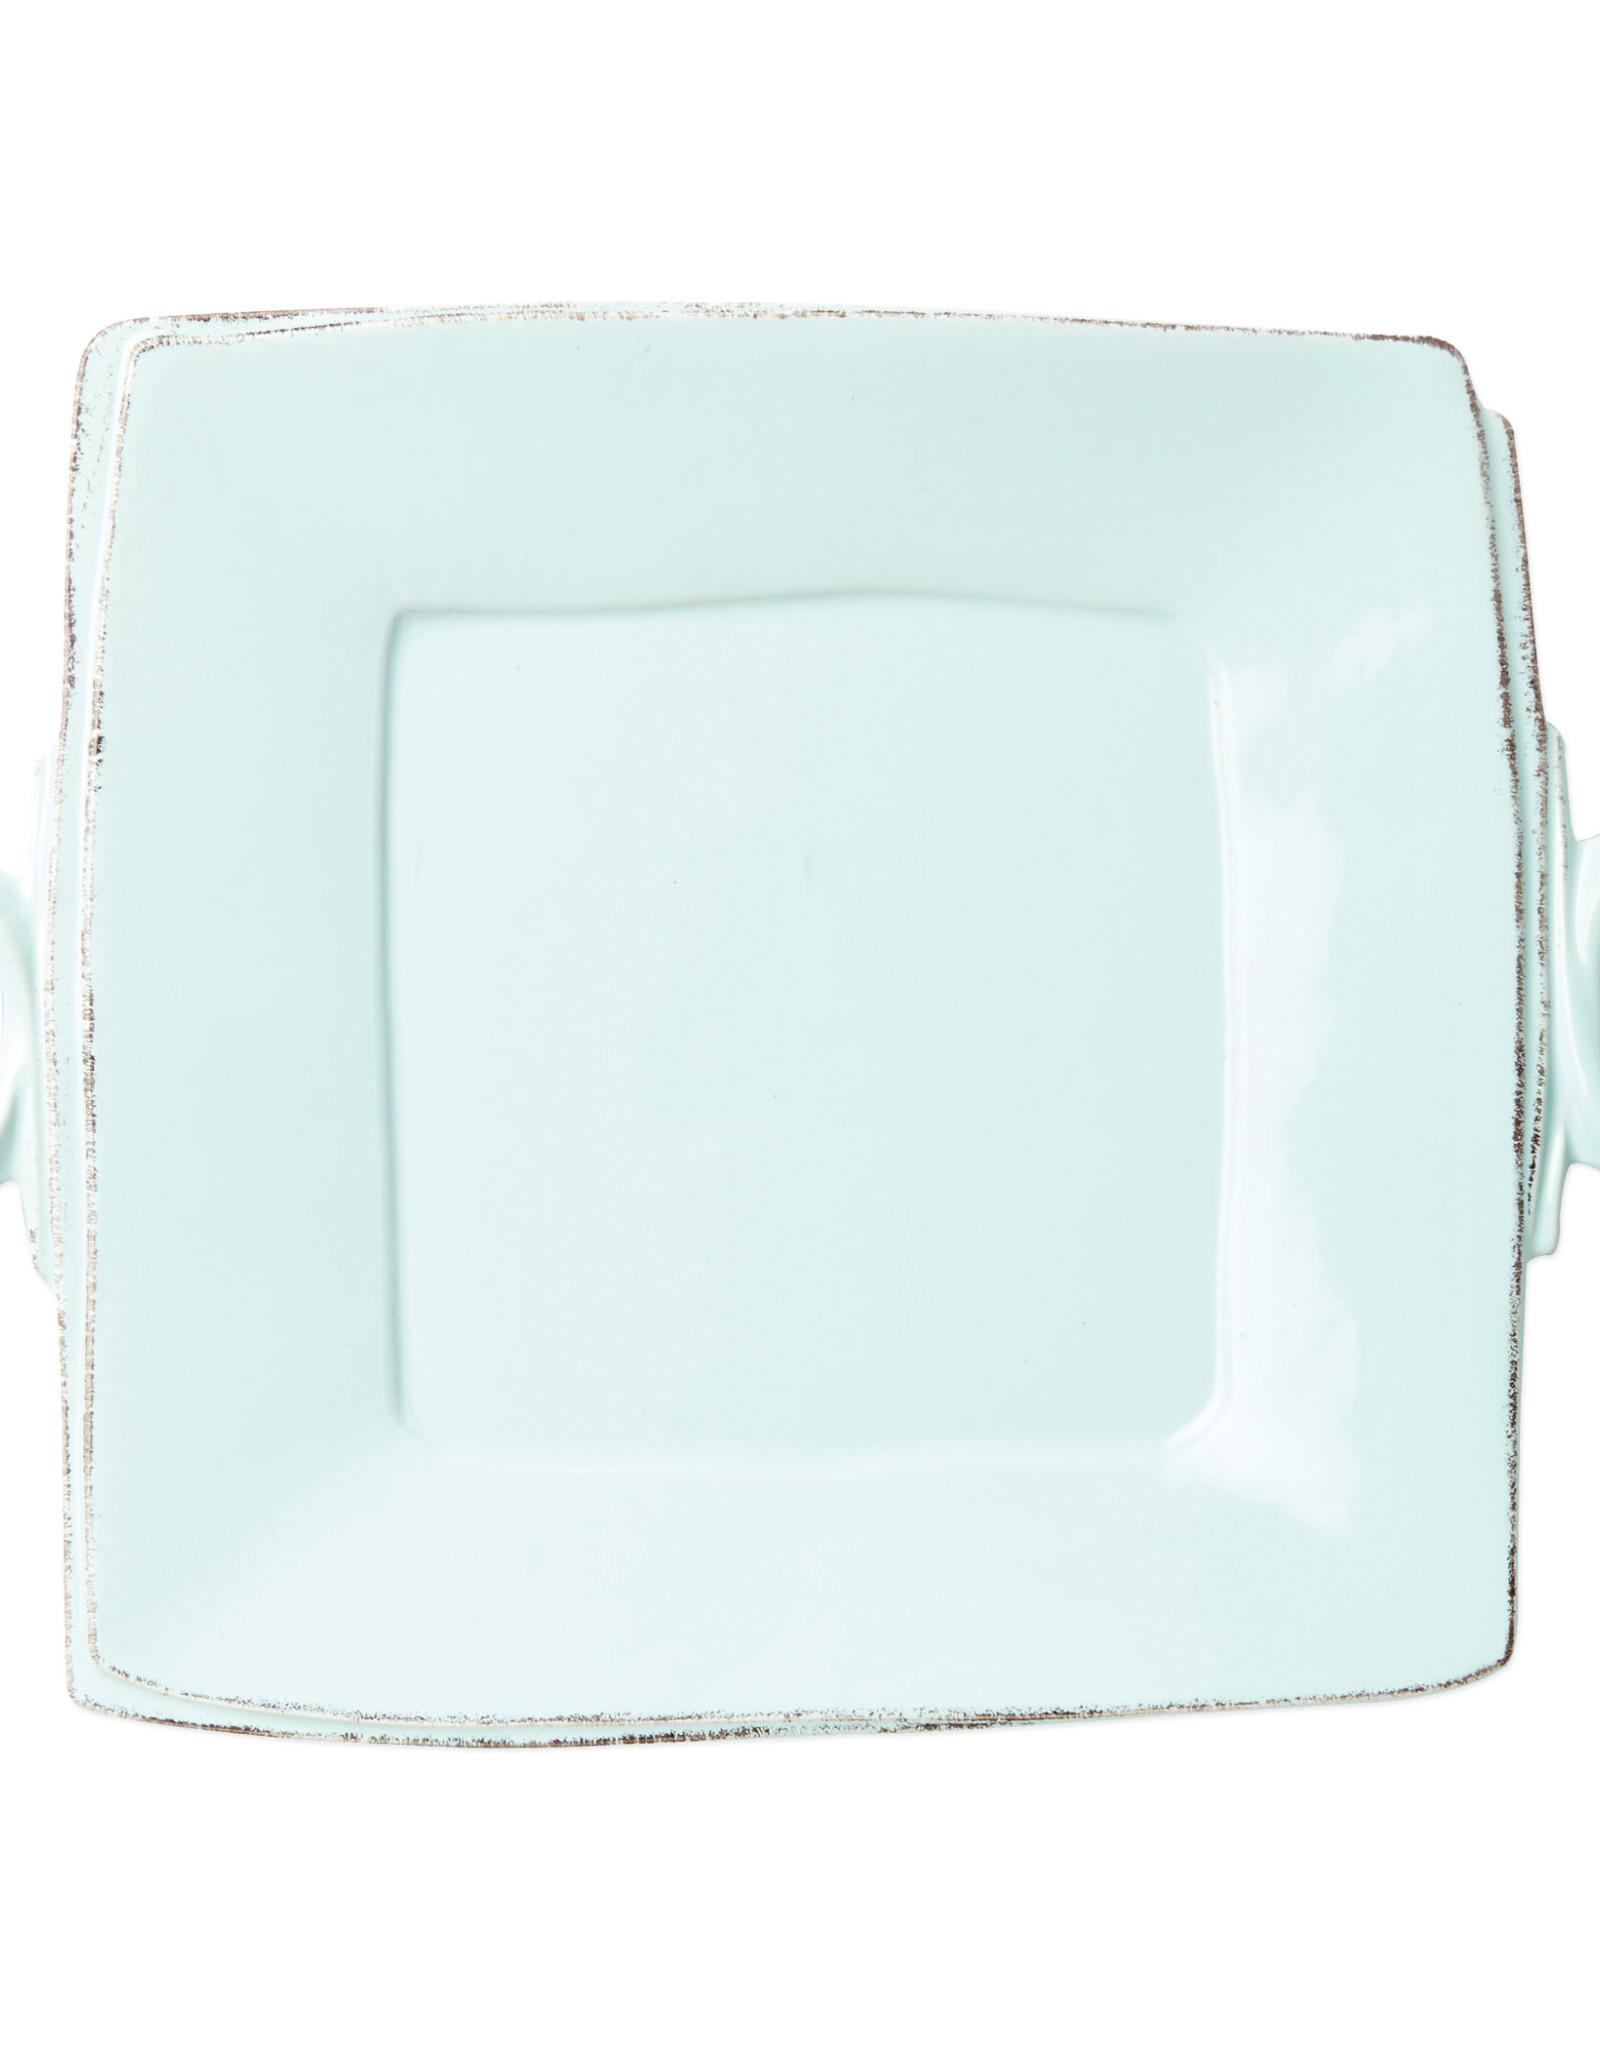 Vietri Lastra Handled Square Platter Aqua